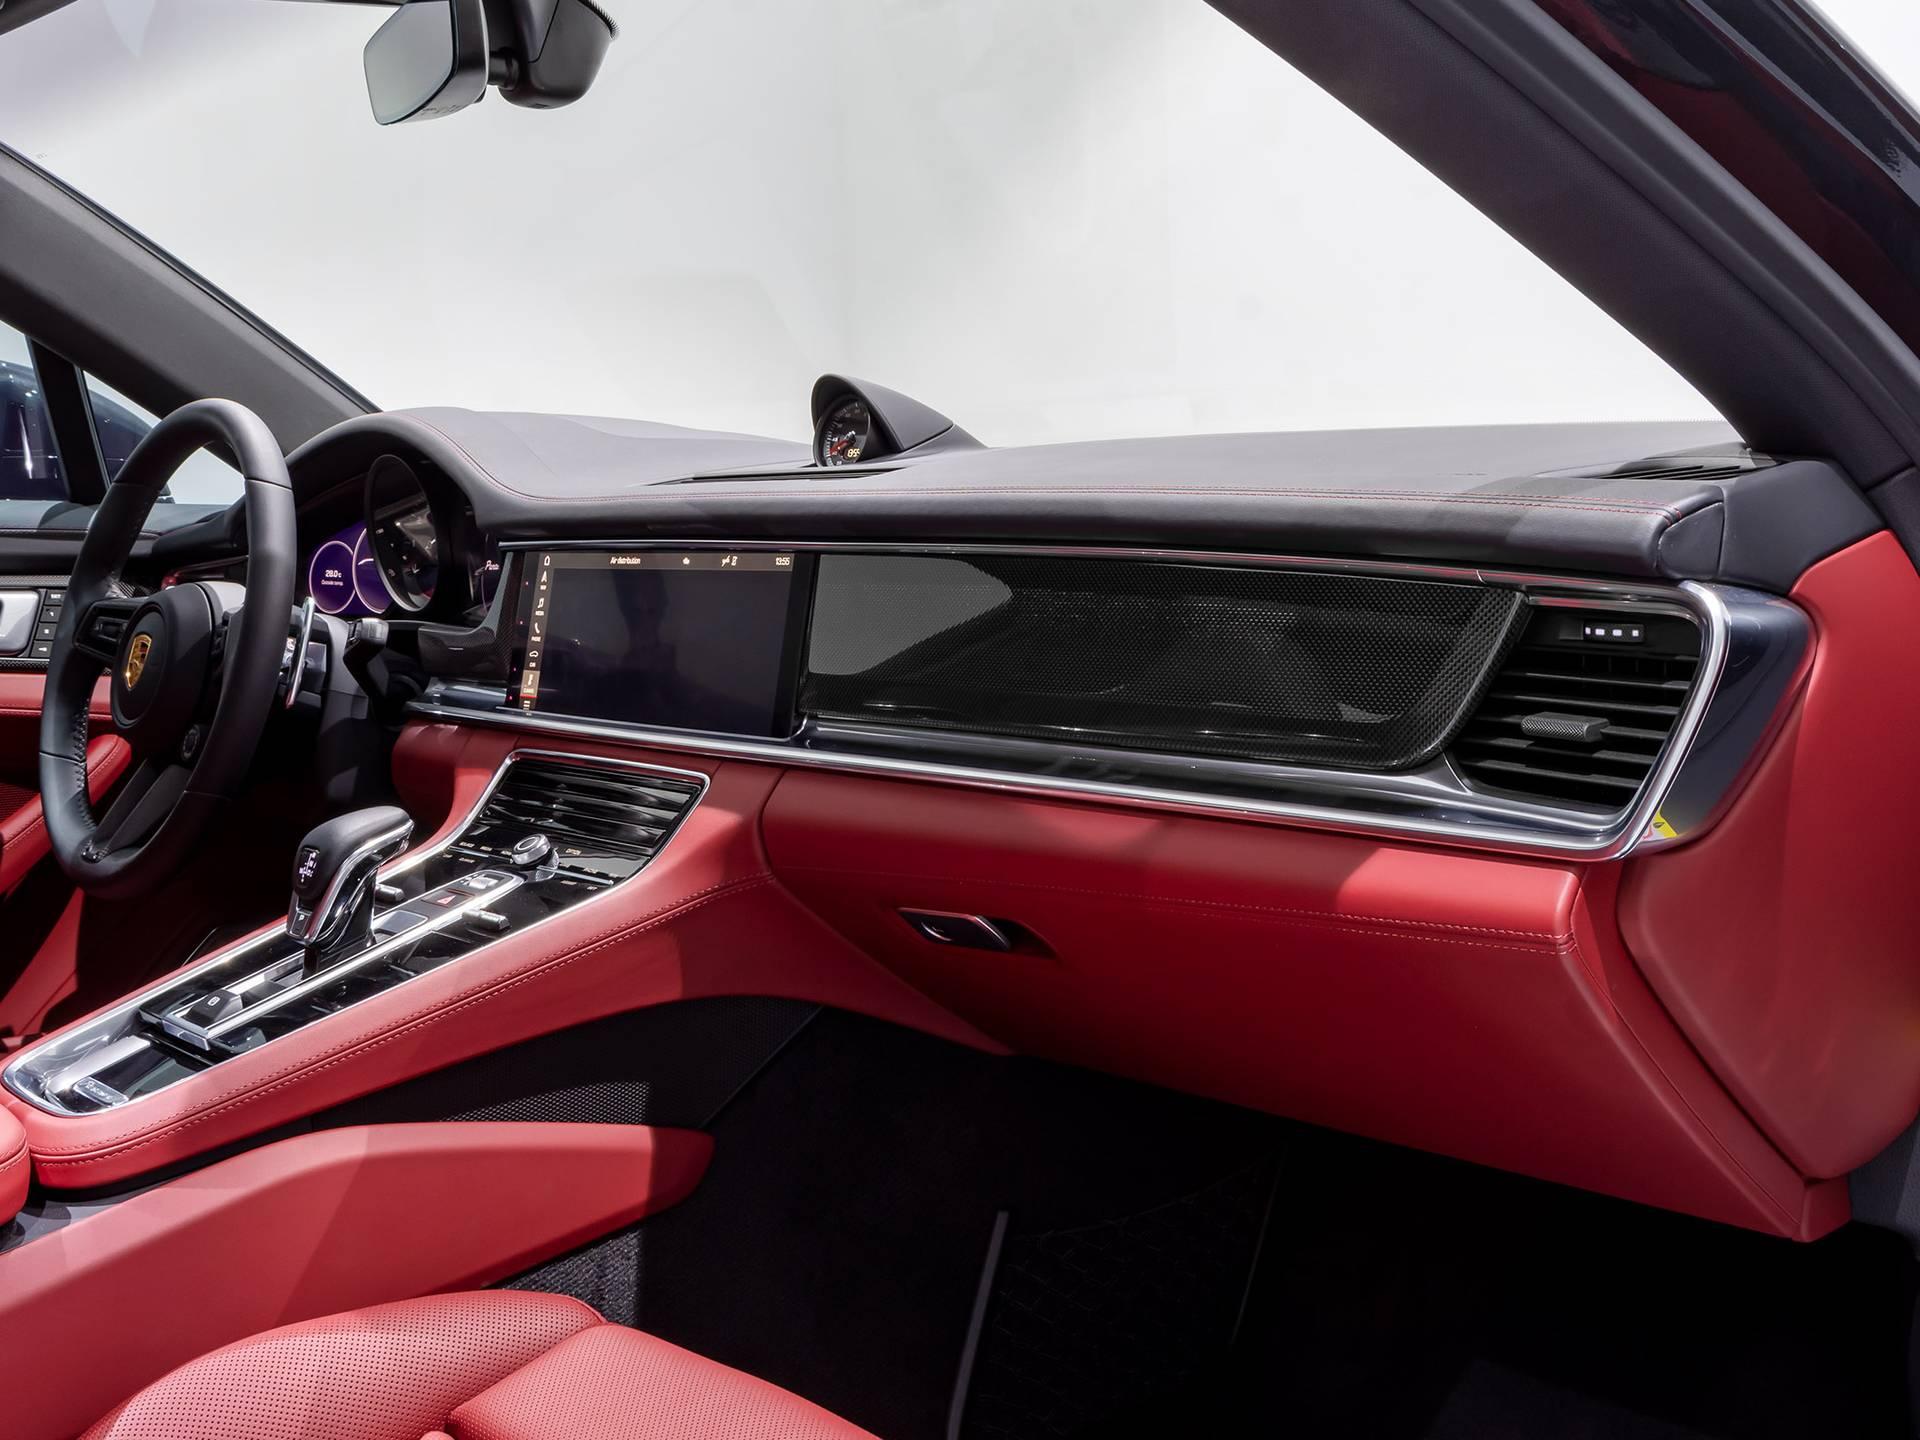 2021 Porsche Panamera – 3